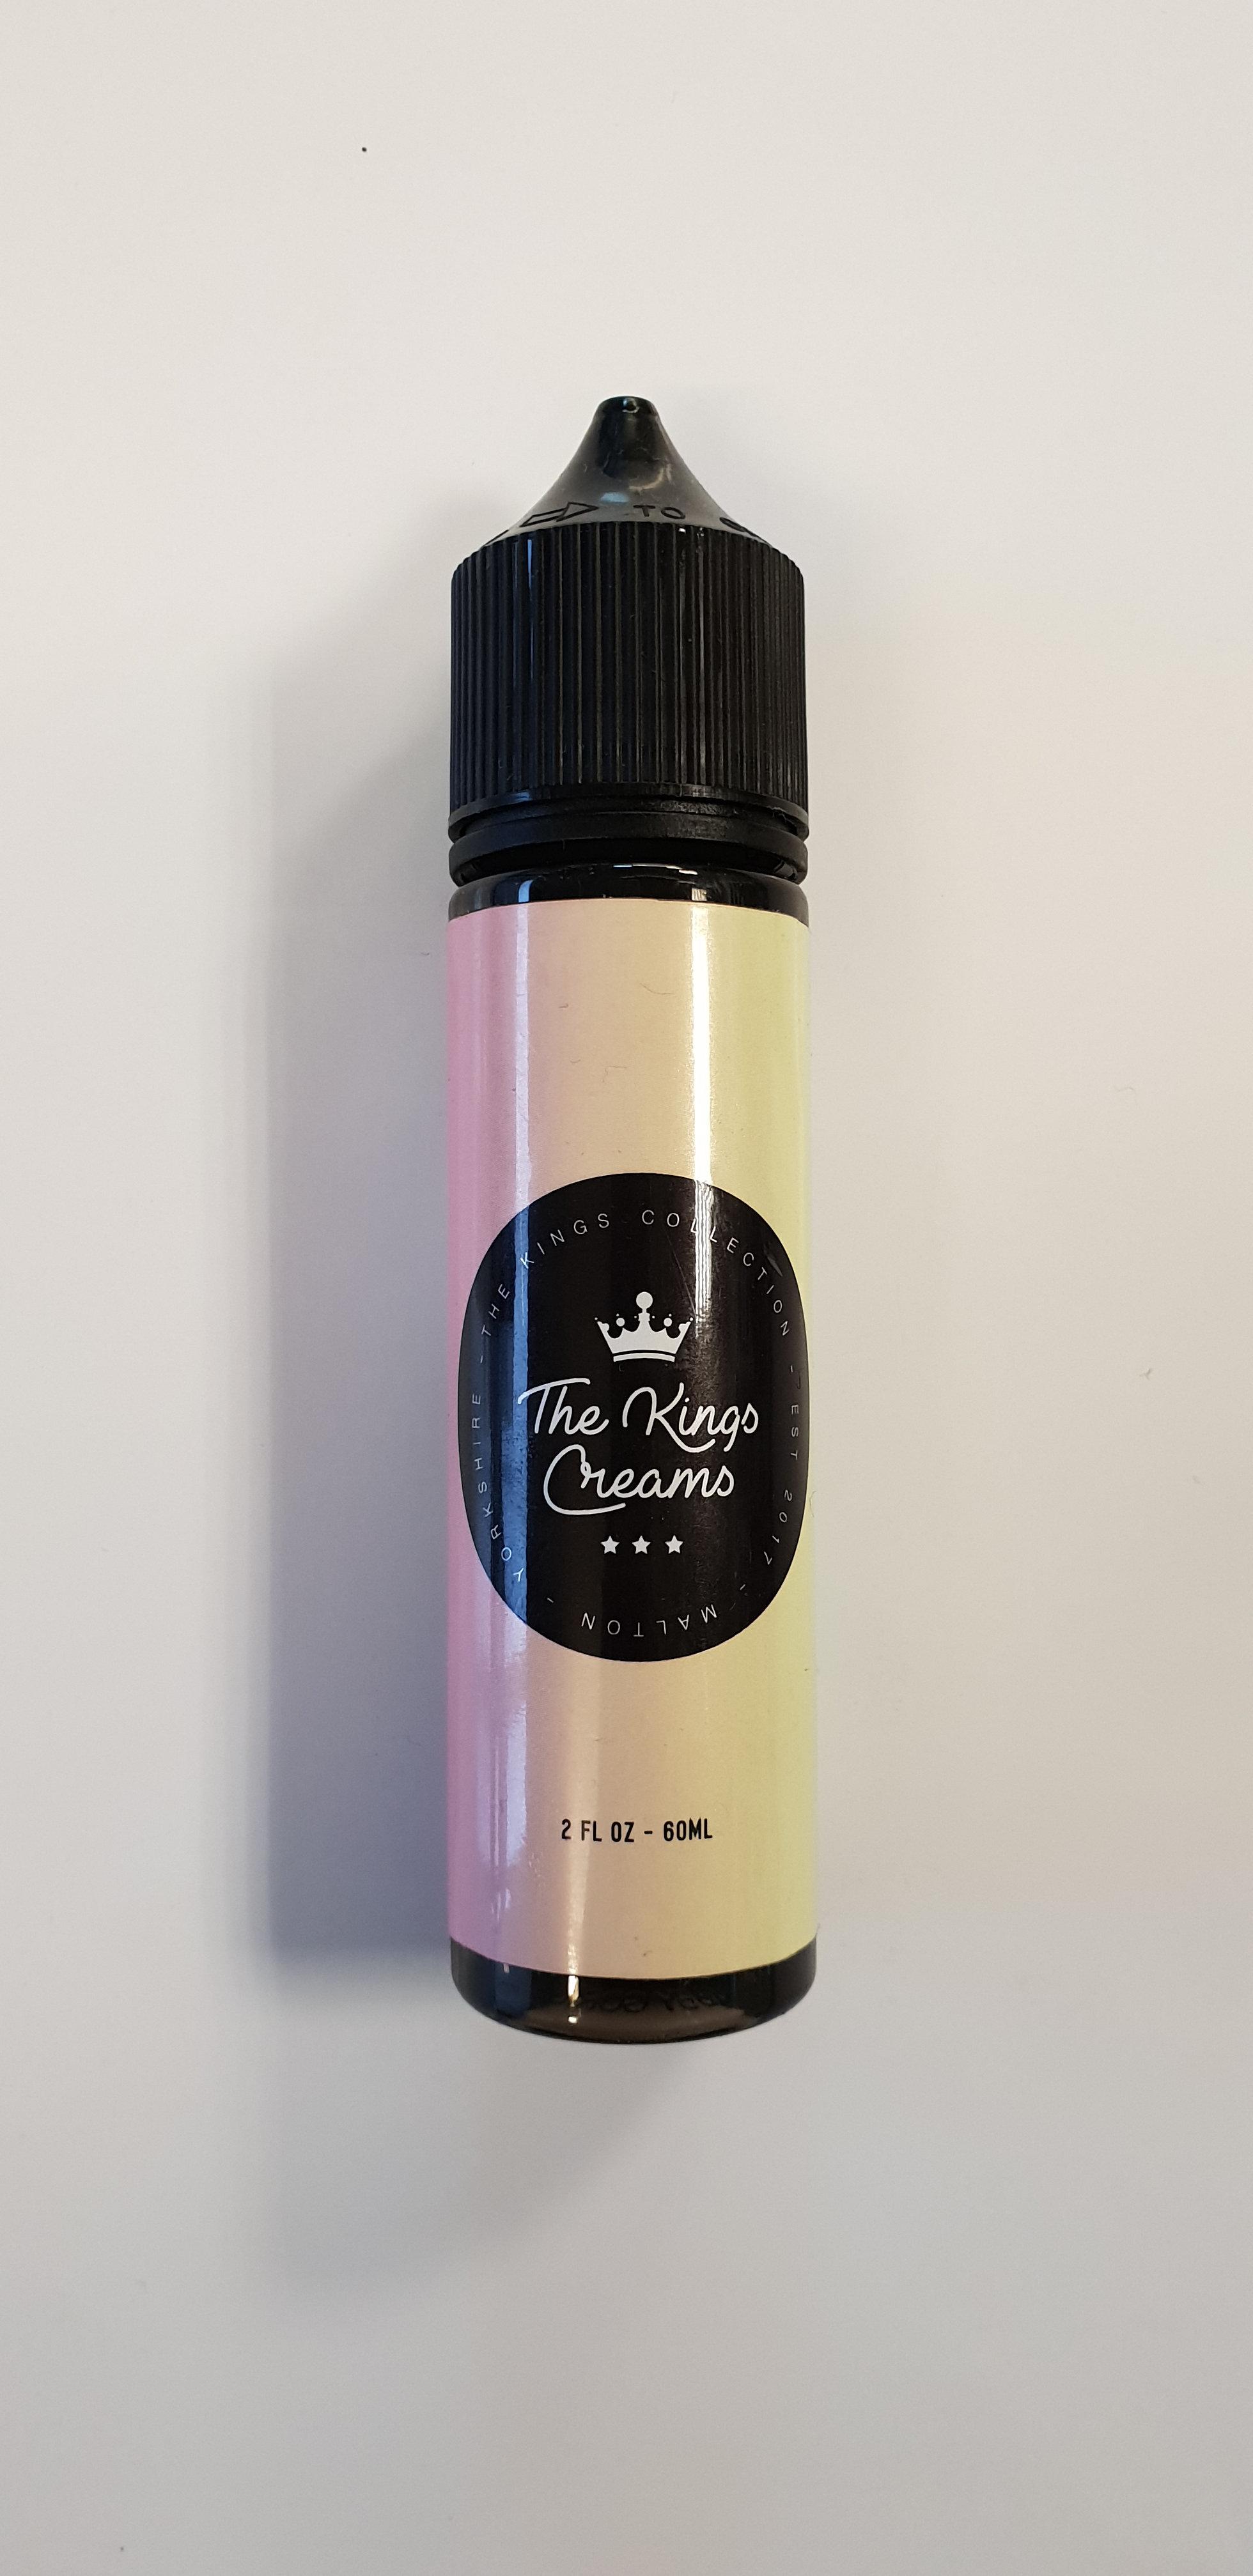 Rainbow Cream 50ml / 100ml vapour-boutique